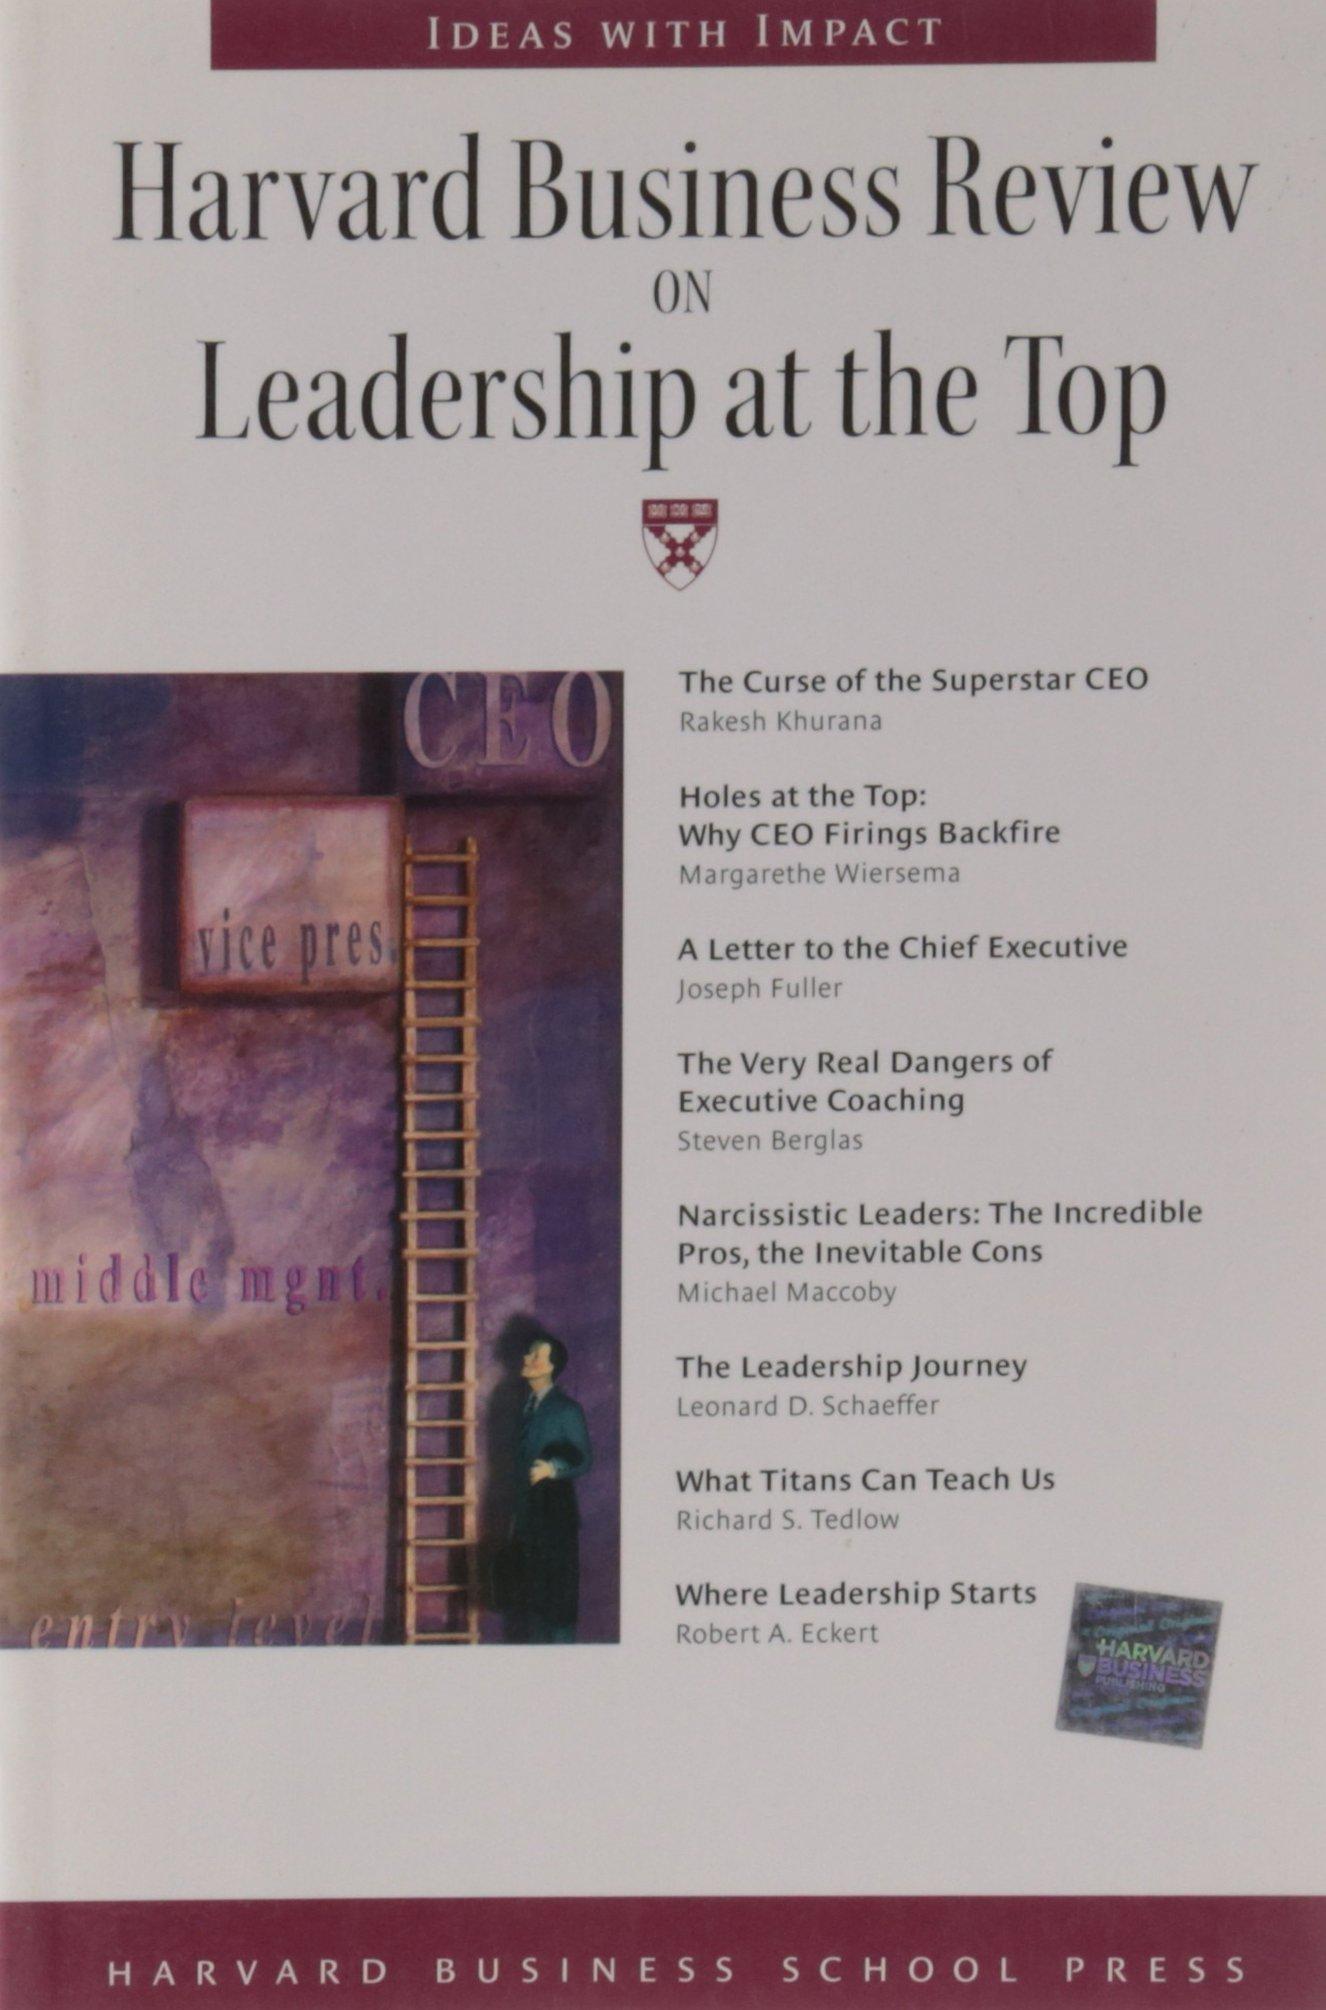 Download Harvard Business Review on Leadership at the Top (Harvard Business Review Paperback Series) pdf epub